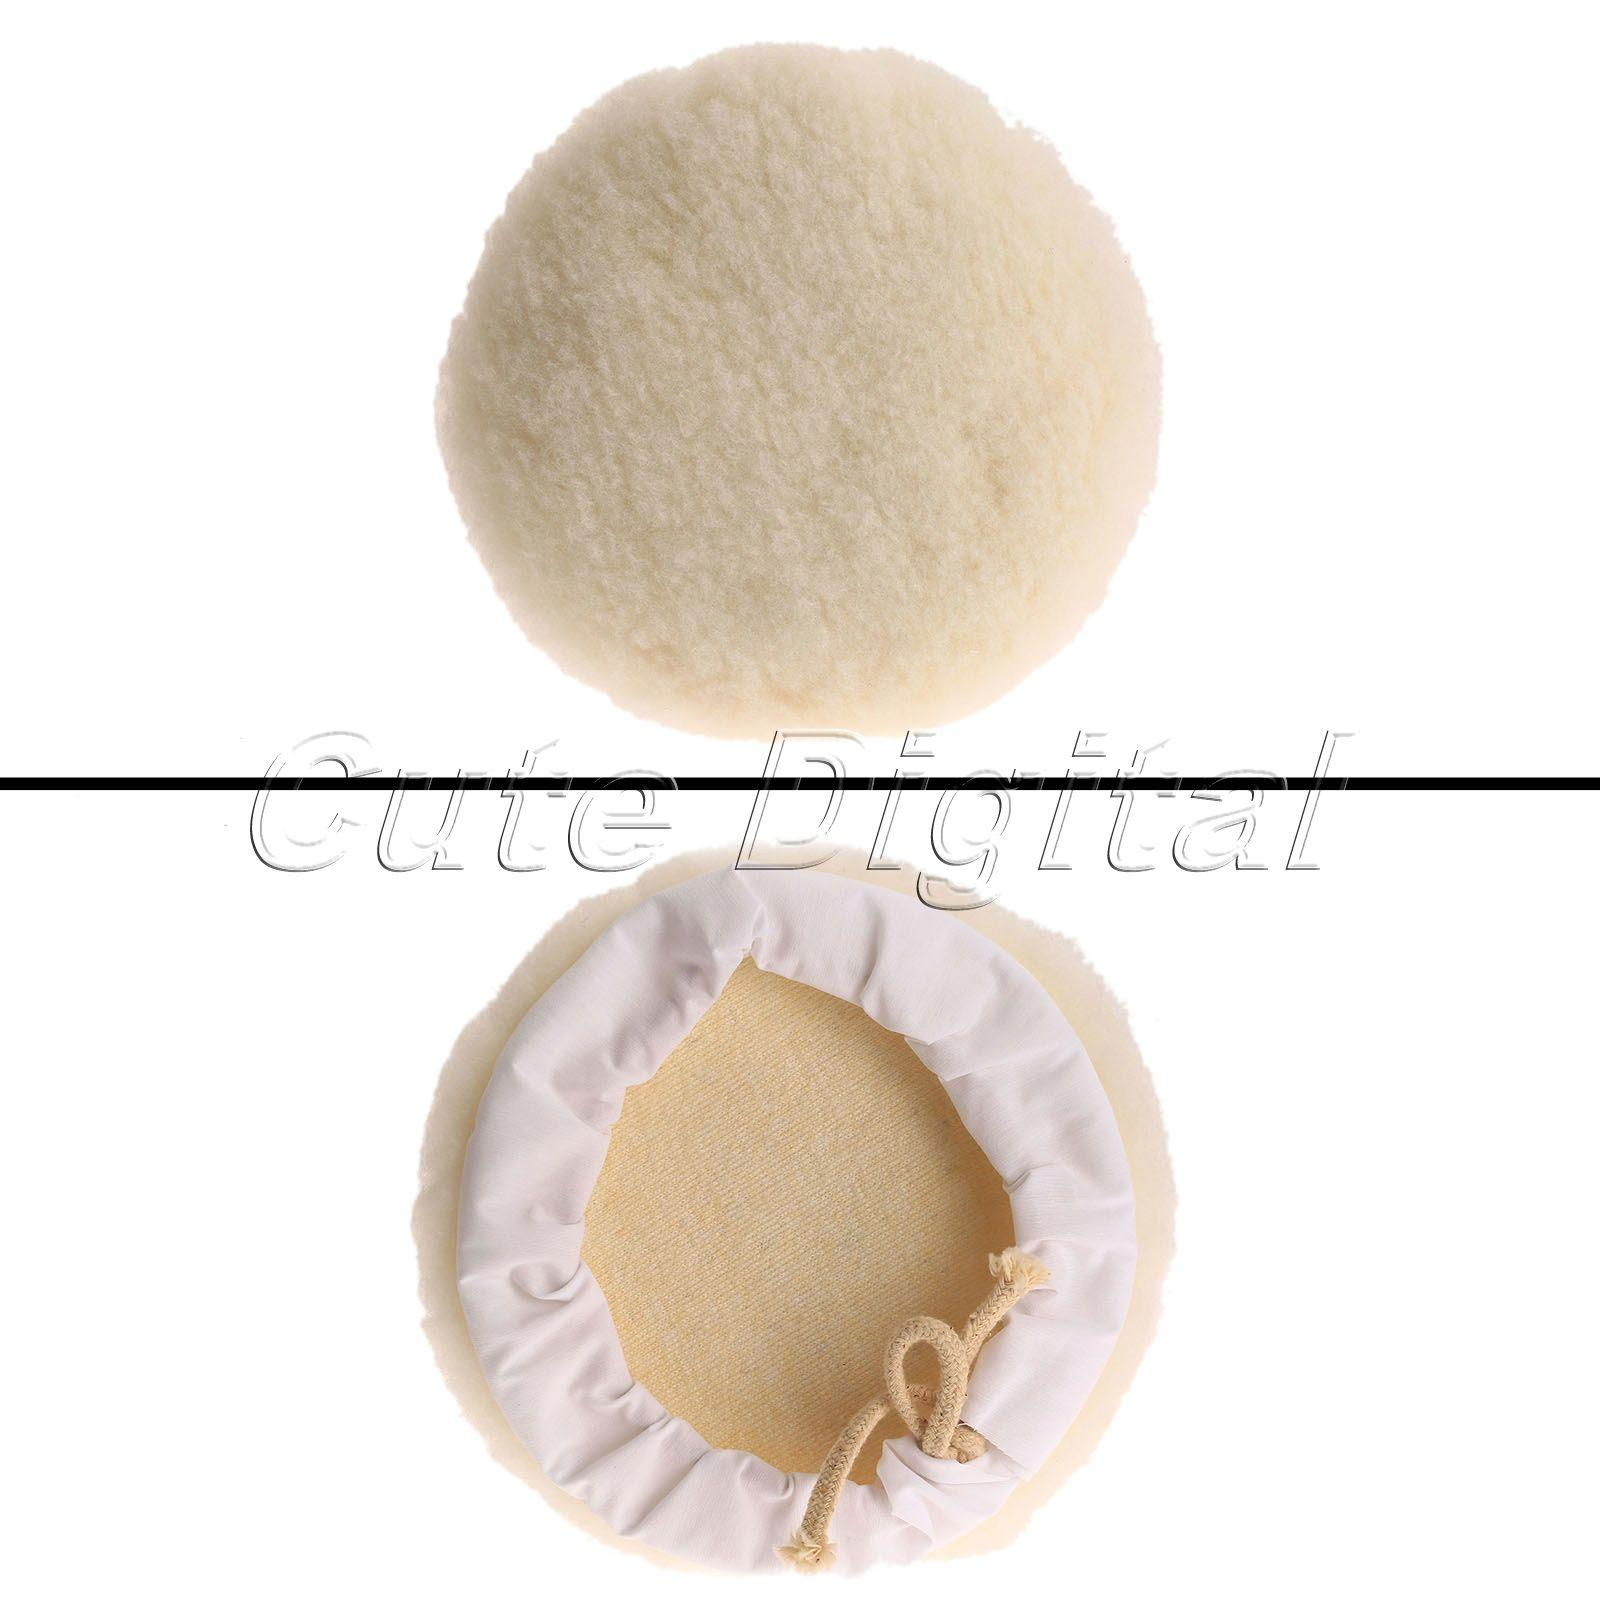 1Pc 180mm Wool Buffing Polisher Buffer Waxing Buffing Polishing Pad Car  Tool For Car Care Dremel Accessories